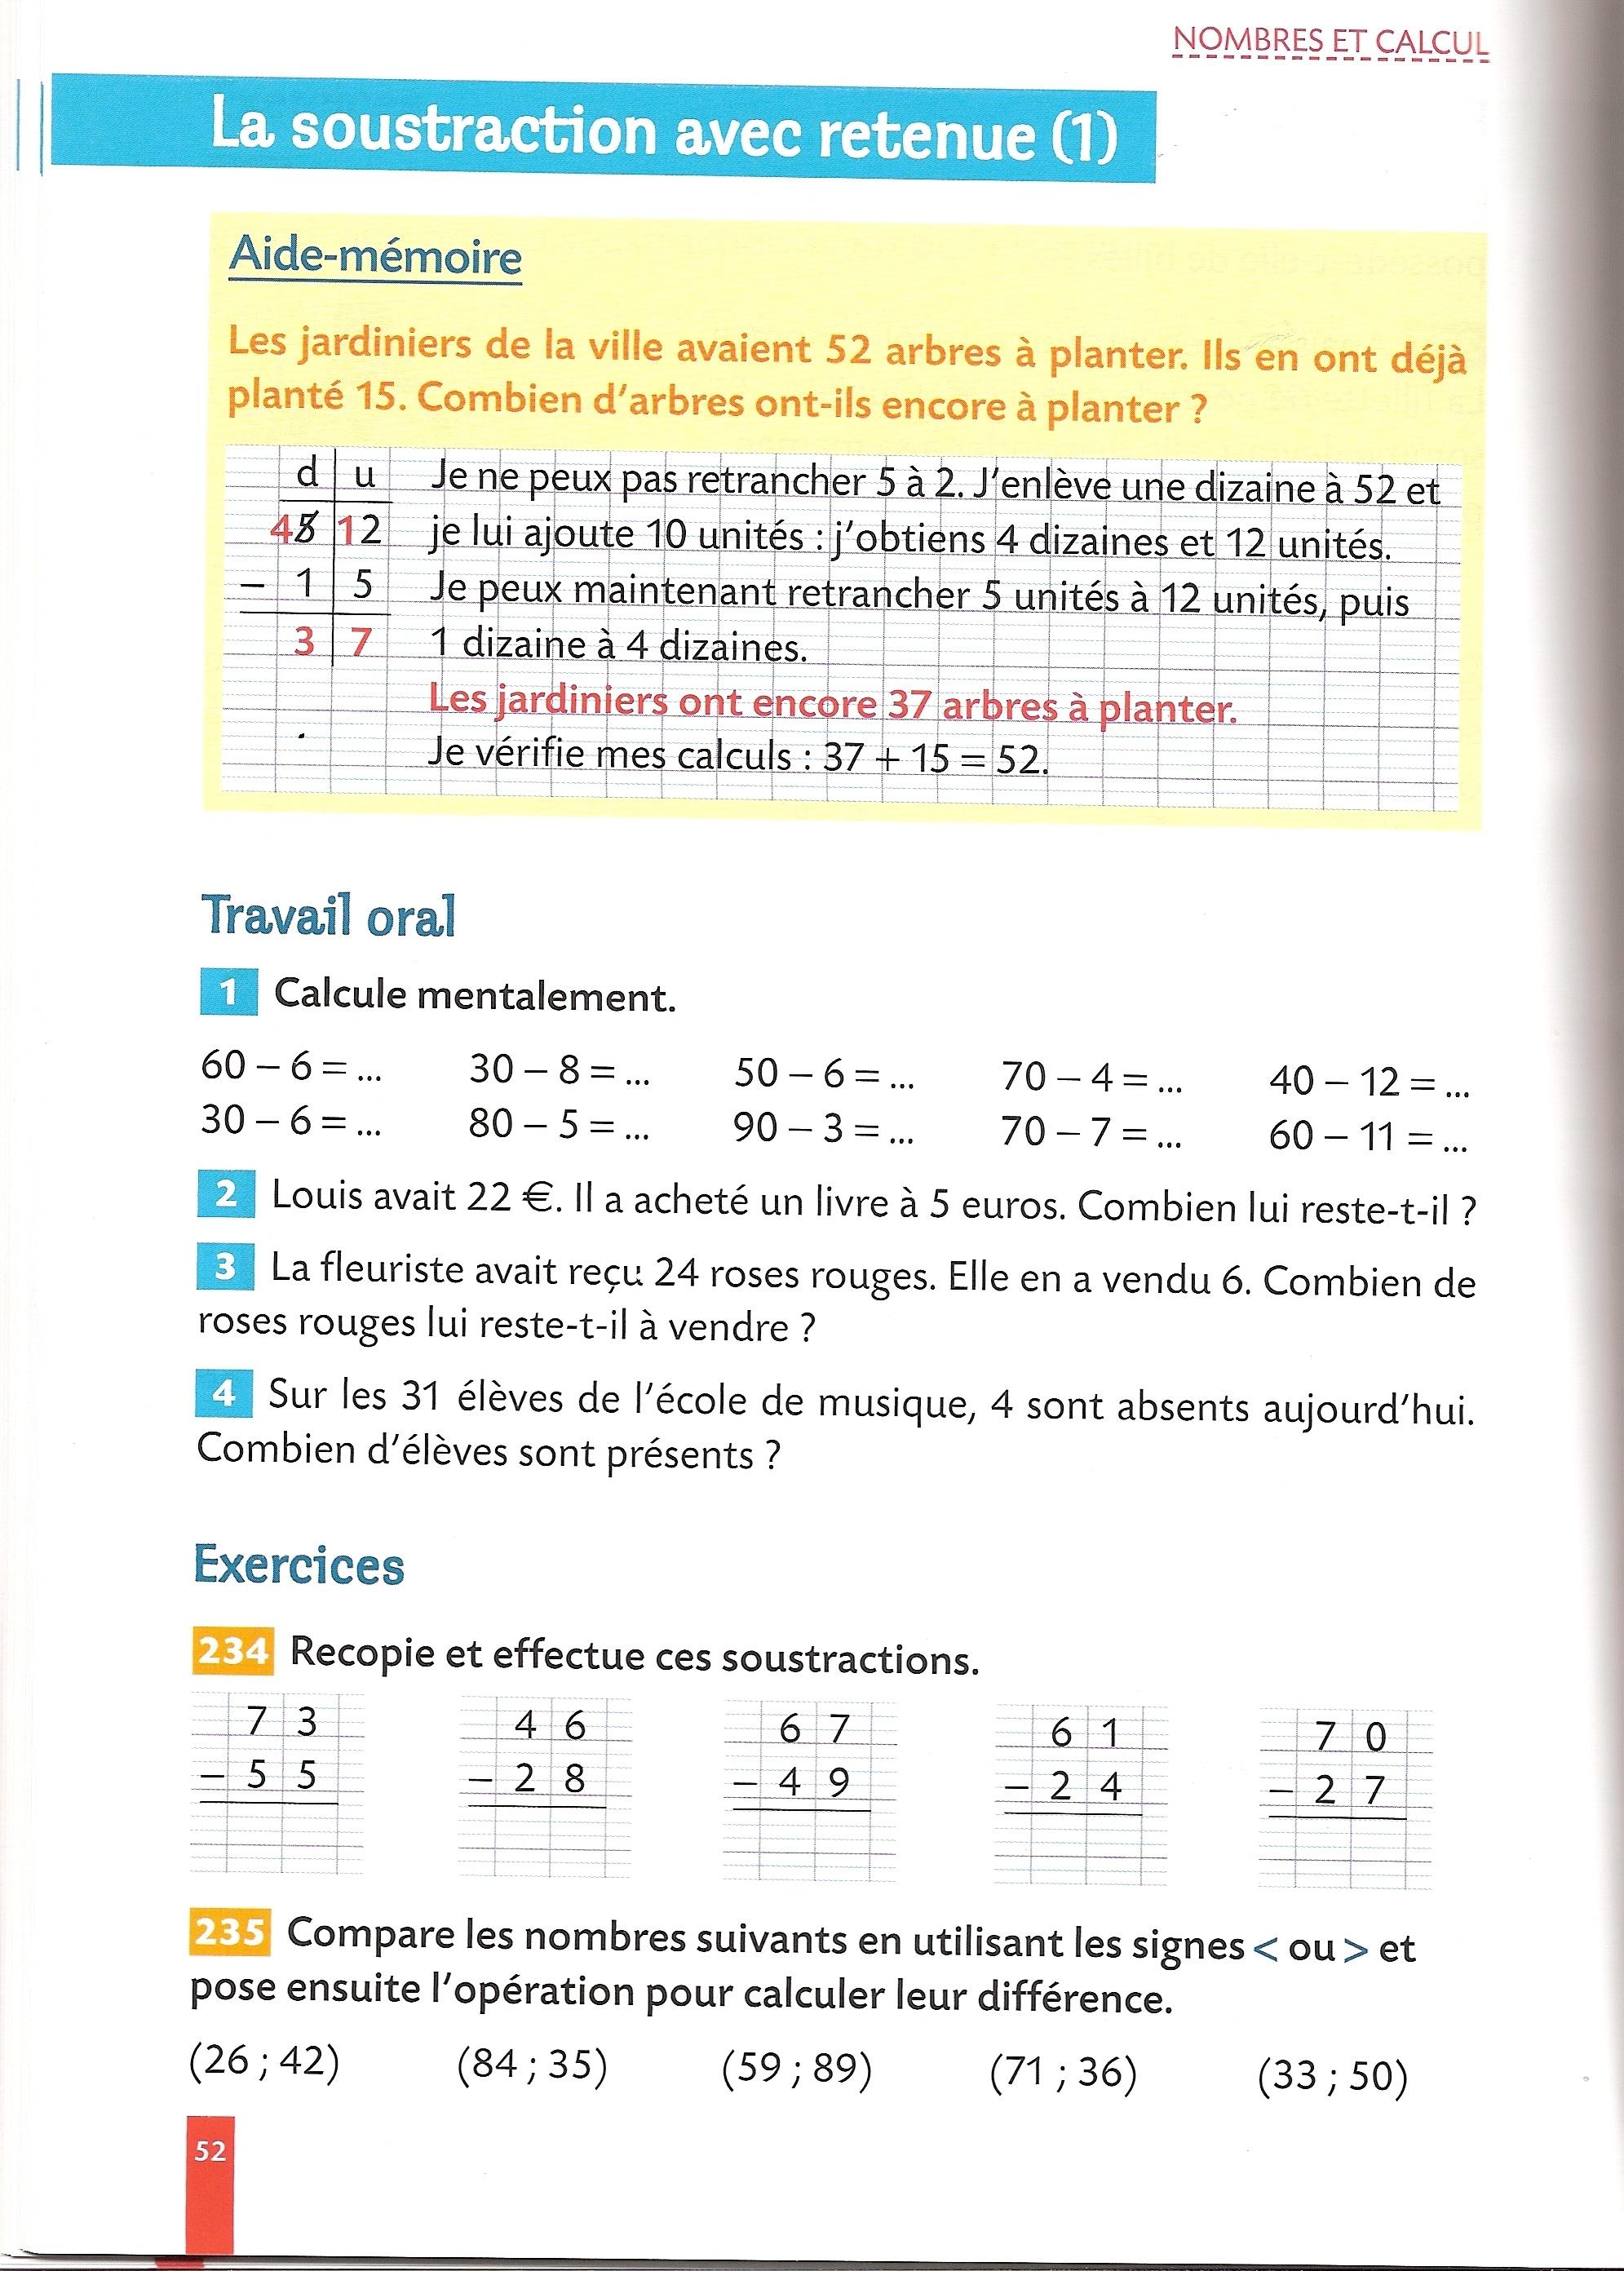 Favori C.L.R. 900 exercices et problèmes CE - Chez Maliluno SQ31